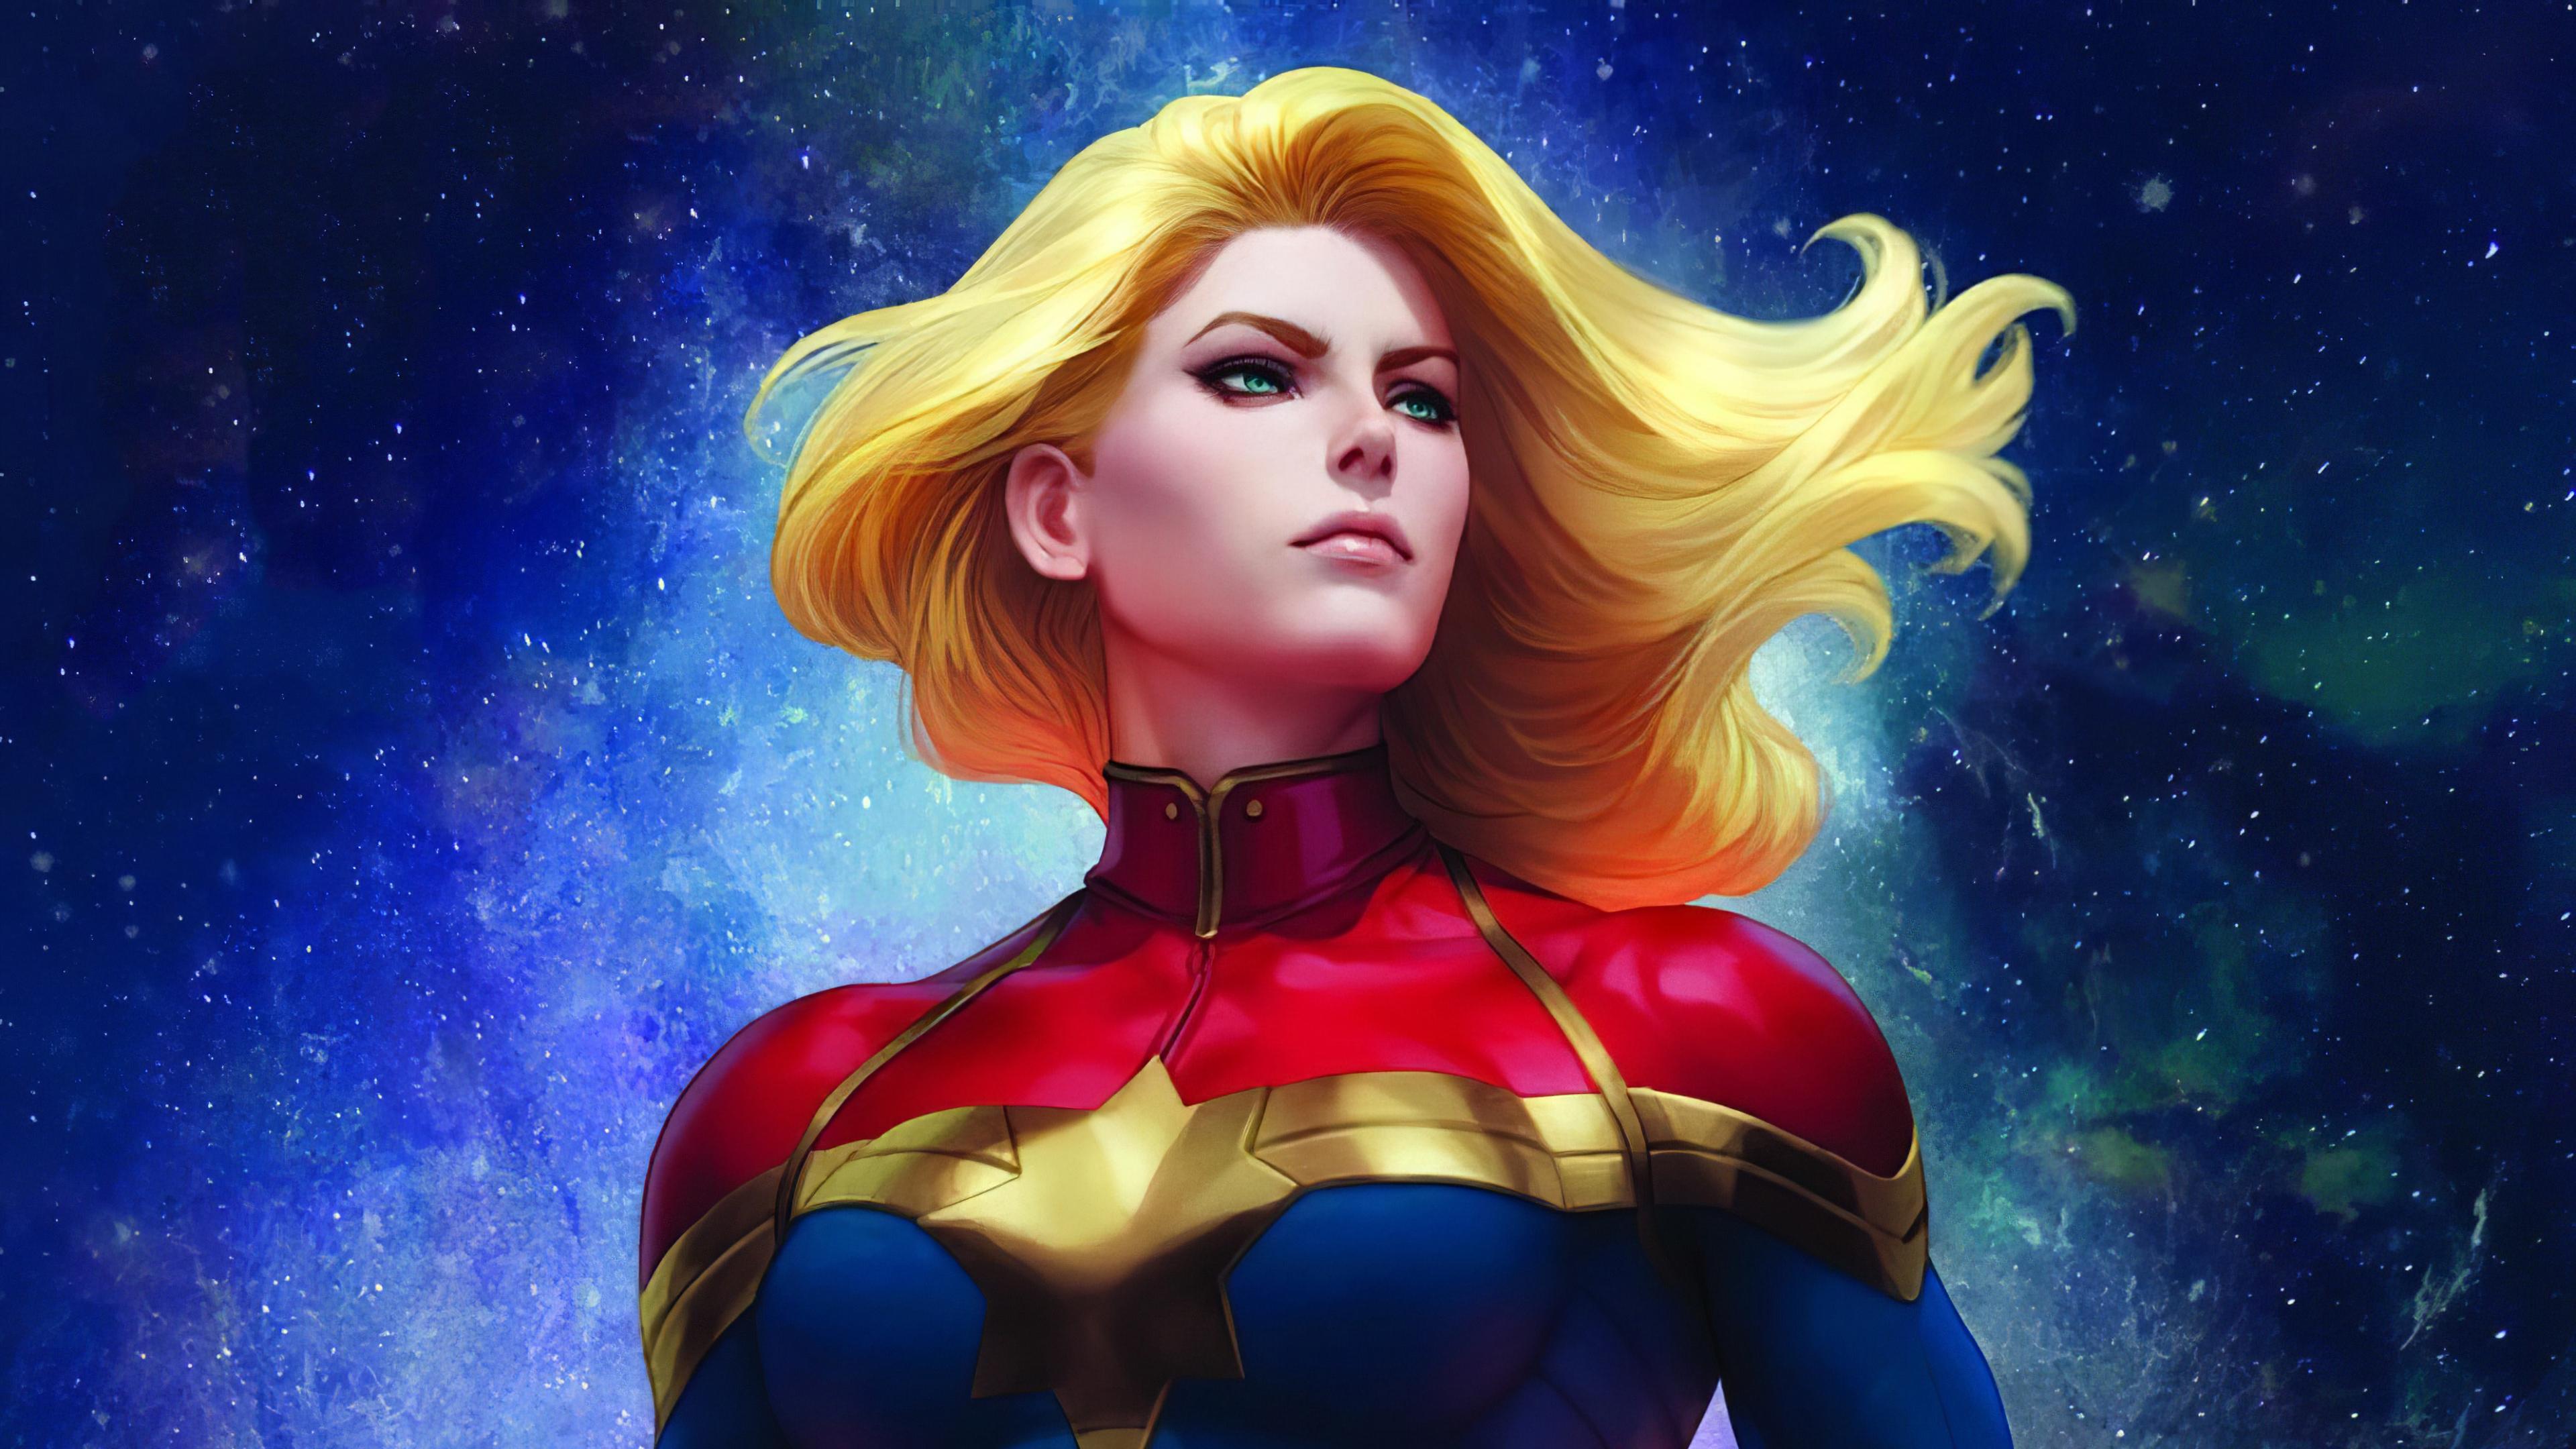 4k Captain Marvel Art 2020, HD Superheroes, 4k Wallpapers ...